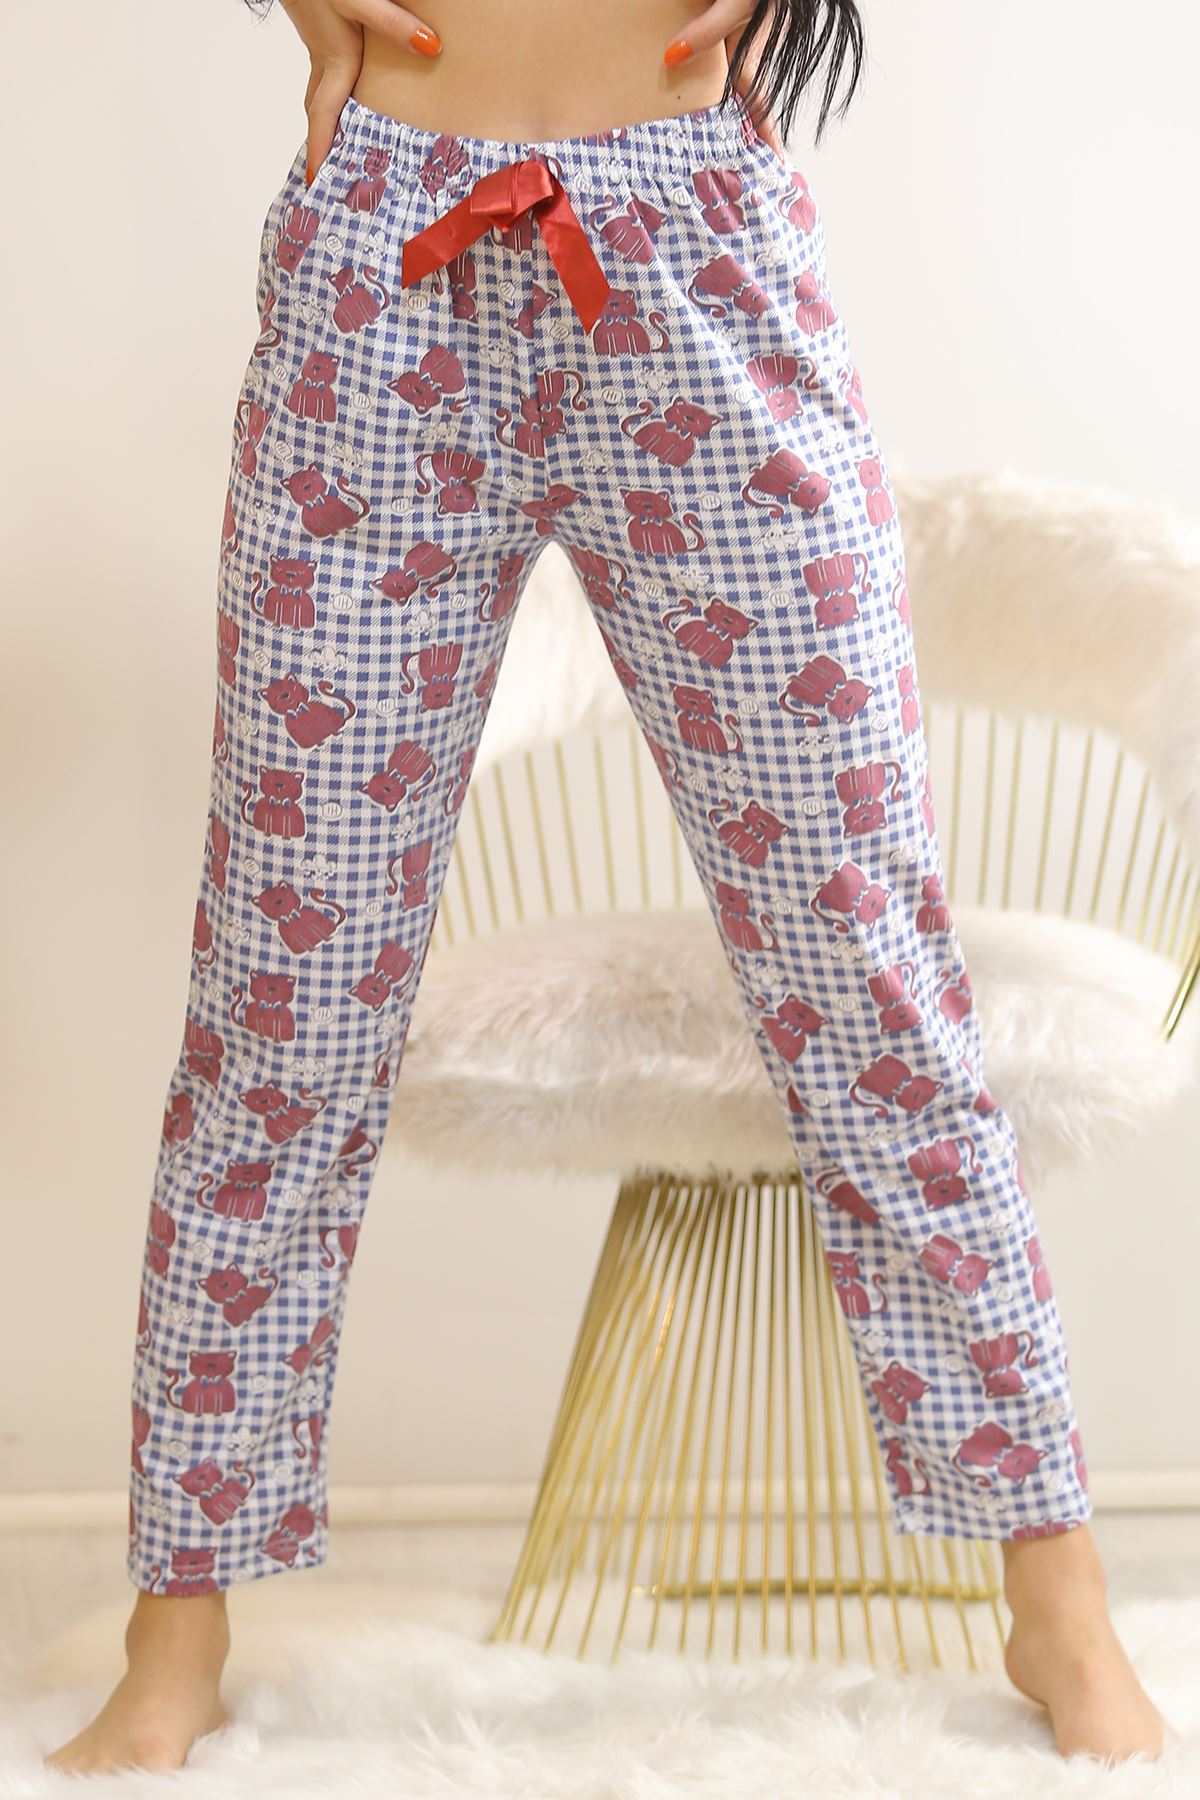 Desenli Pijama Altı Karelilaci - 5518.919.